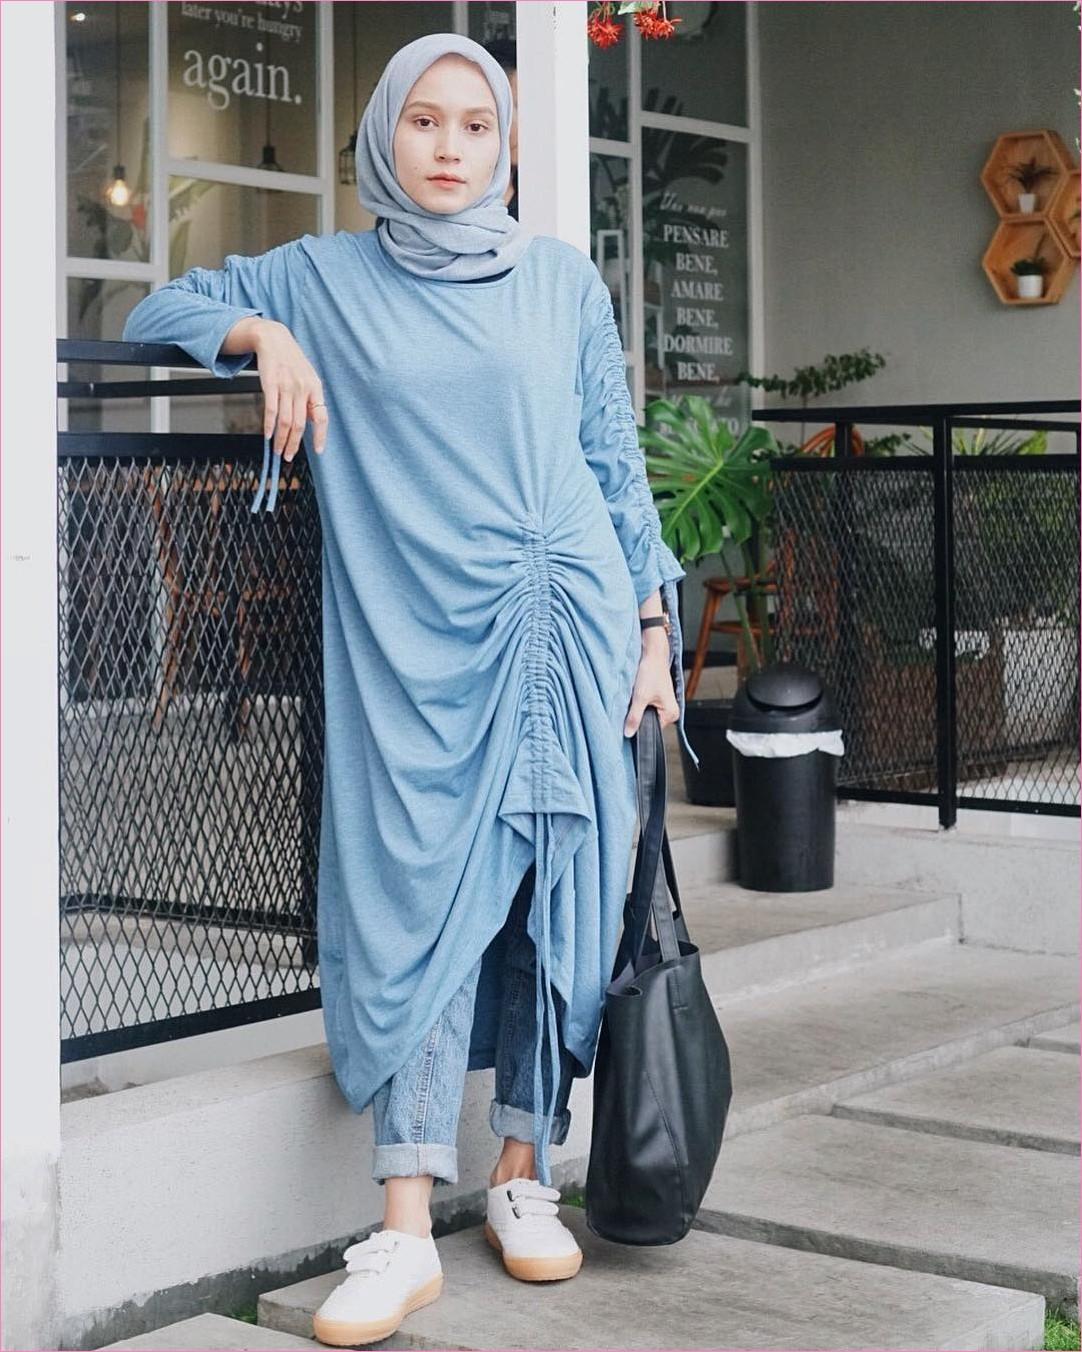 Outfit Baju Tunic Untuk Hijabers Ala Selebgram 2018 baju tunic biru laut celana jeans denim lace ups kets sneakers putih tote bag hitam jam tangan kerudung segiempat hijab square biru pastel cafe trendy ootd kekinian pager